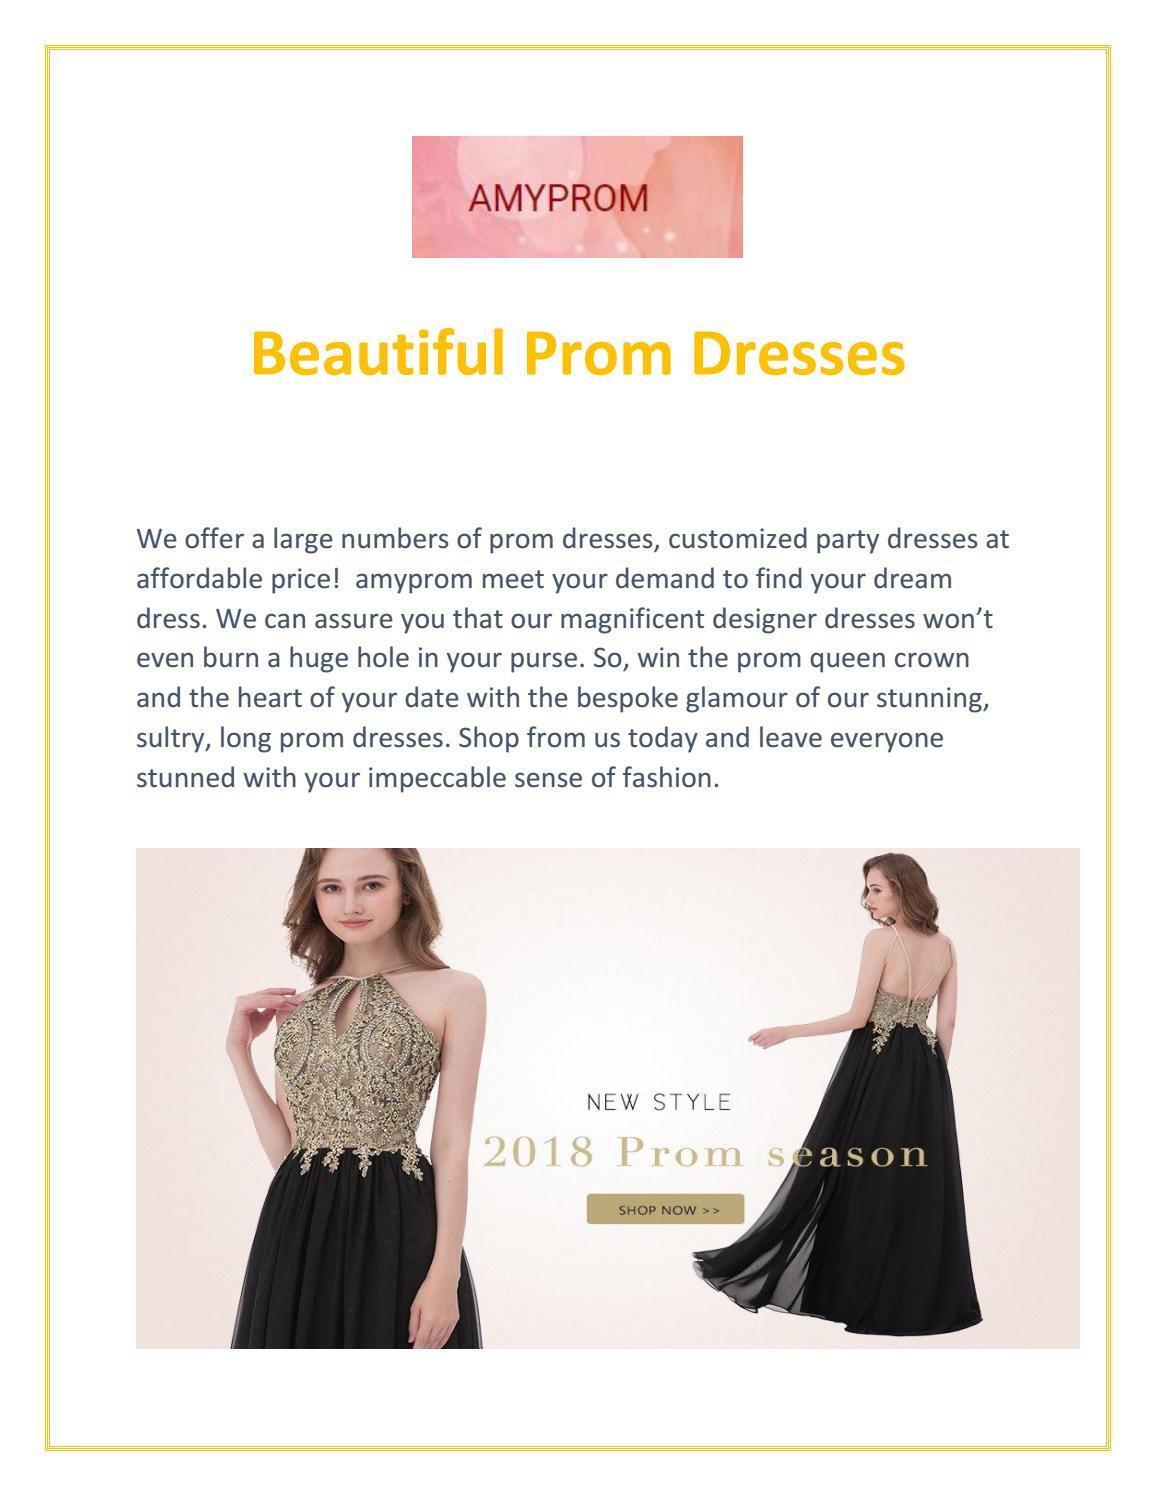 Beautiful Prom Dresses - Amyprom